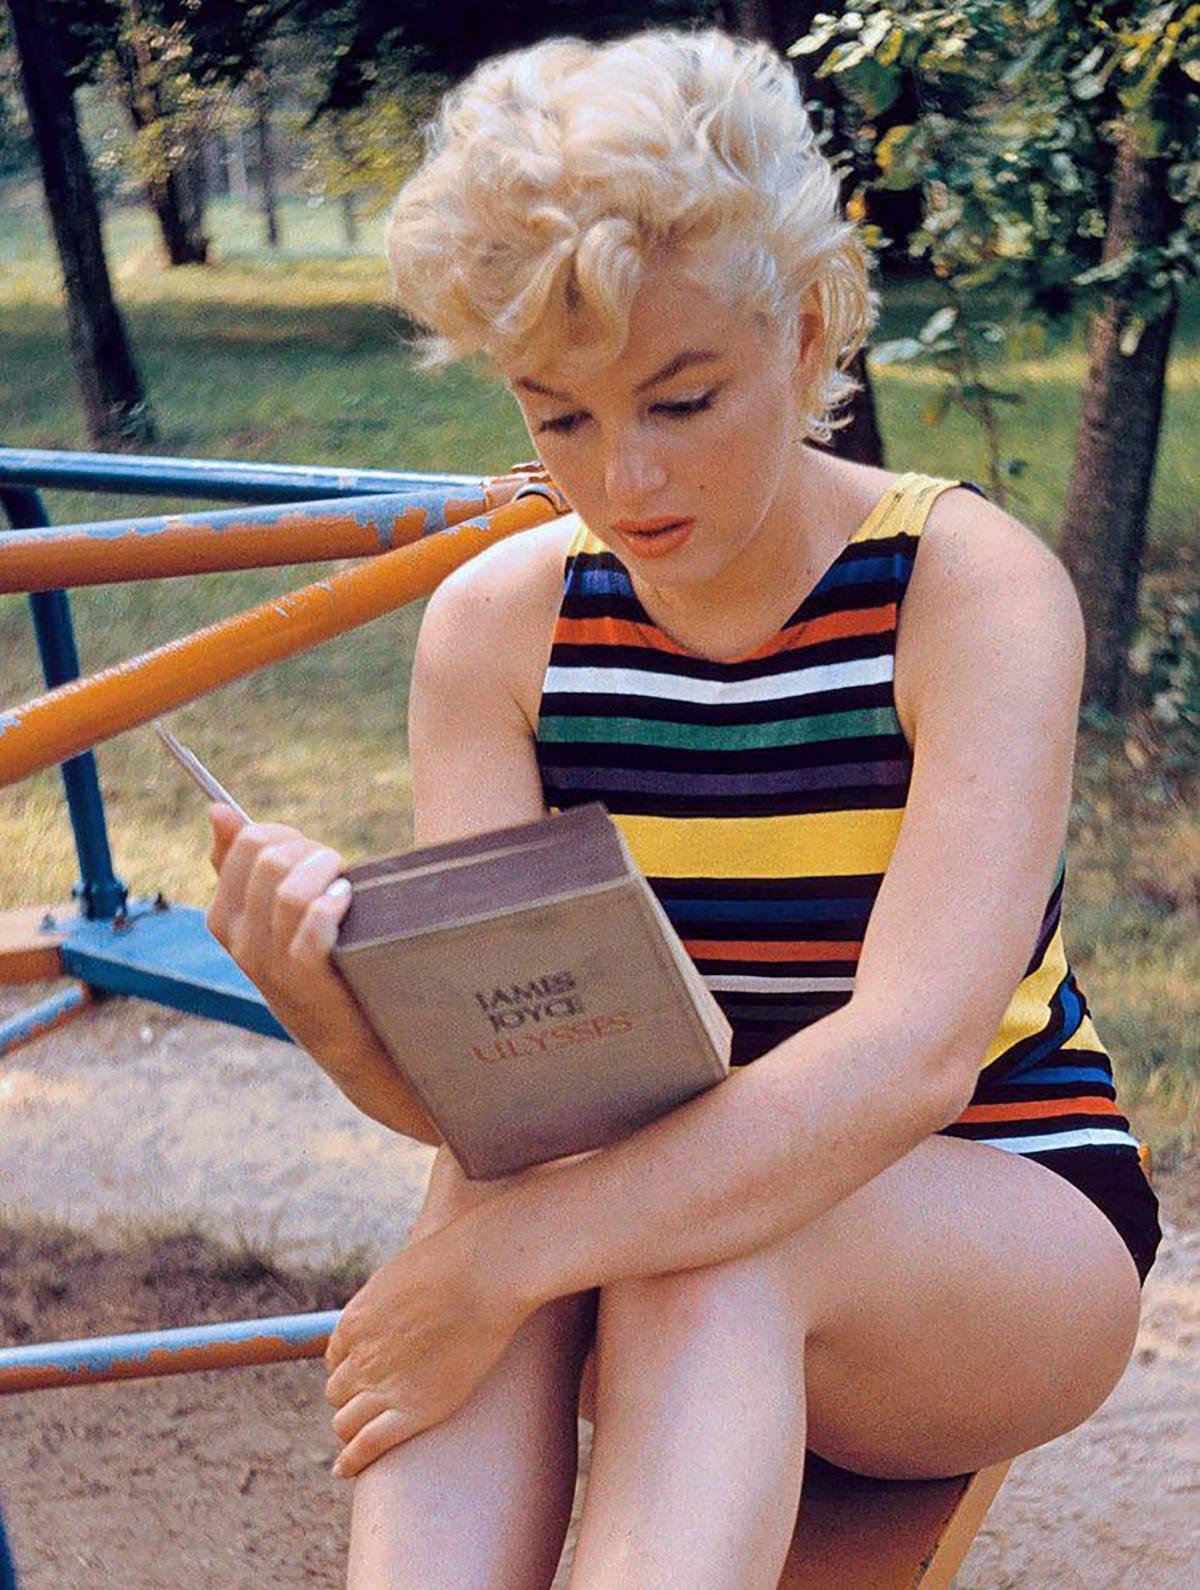 Un podcast rivela perché Frank Sinatra e Marilyn Monroe non si sposarono